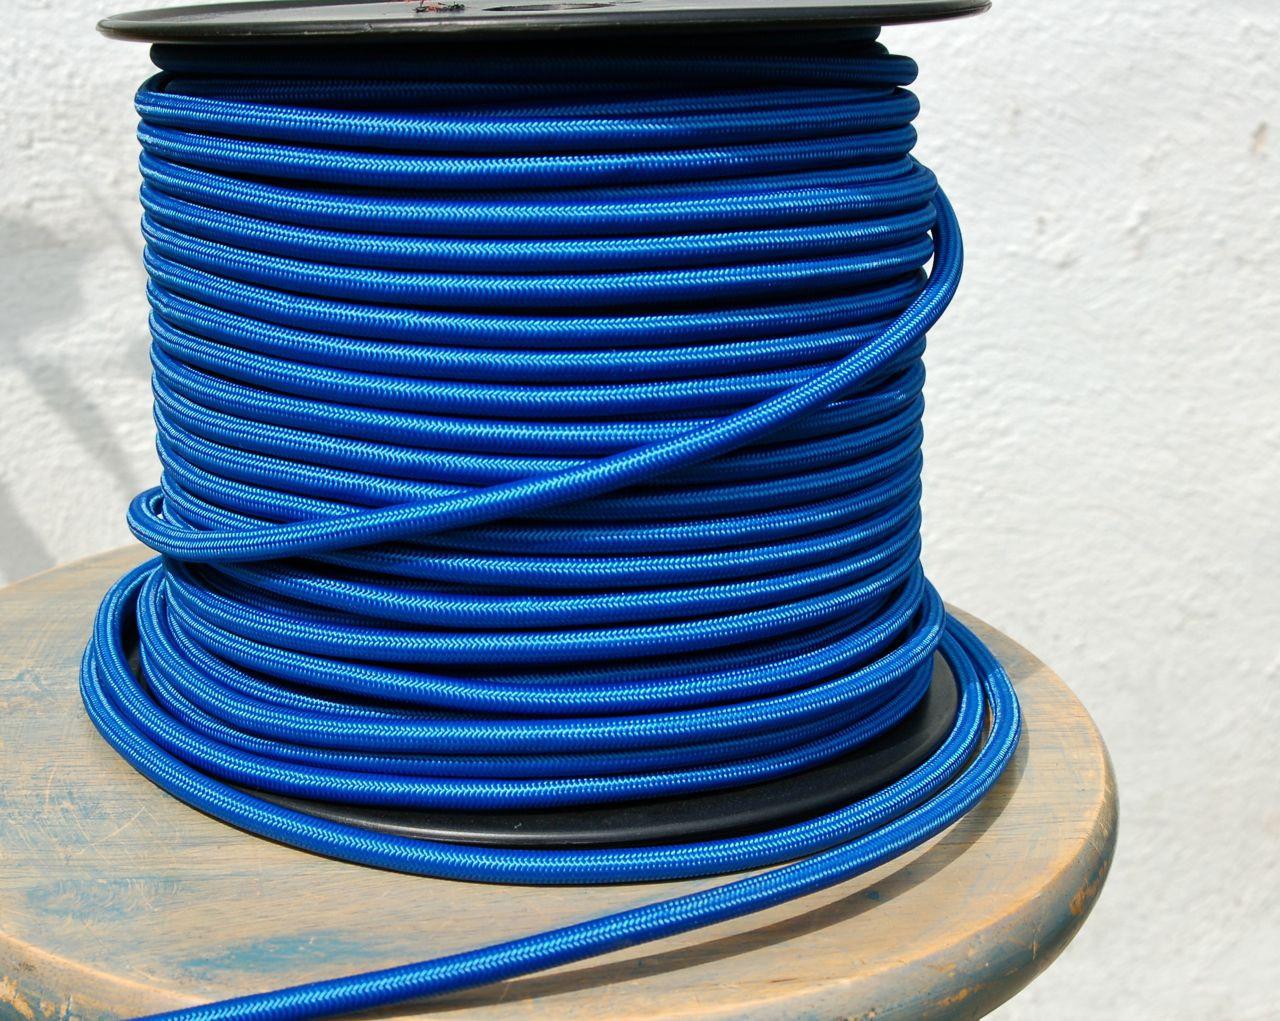 blue round cloth covered 3 wire cord, nylon per foot snake headblue round cloth covered 3 wire cord, nylon per foot loading zoom